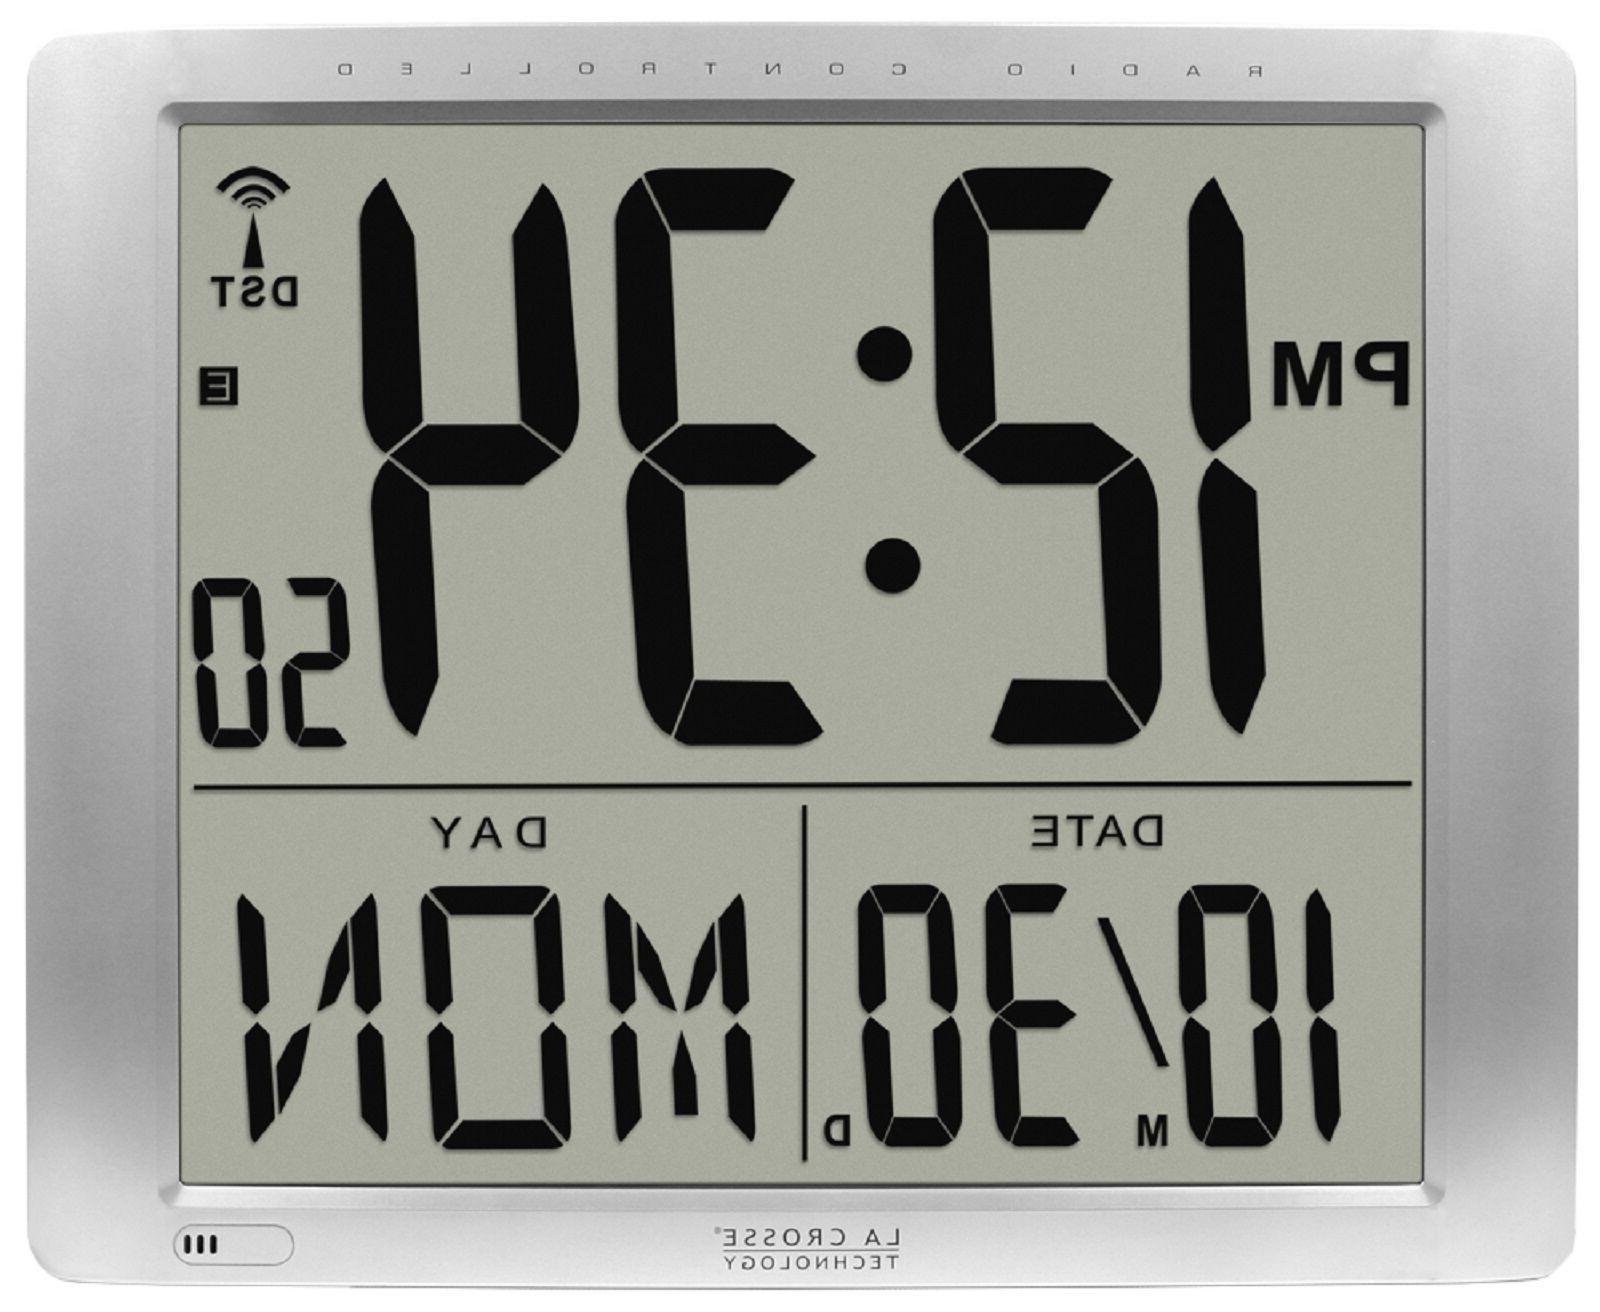 bbb87269 atomic wall clock